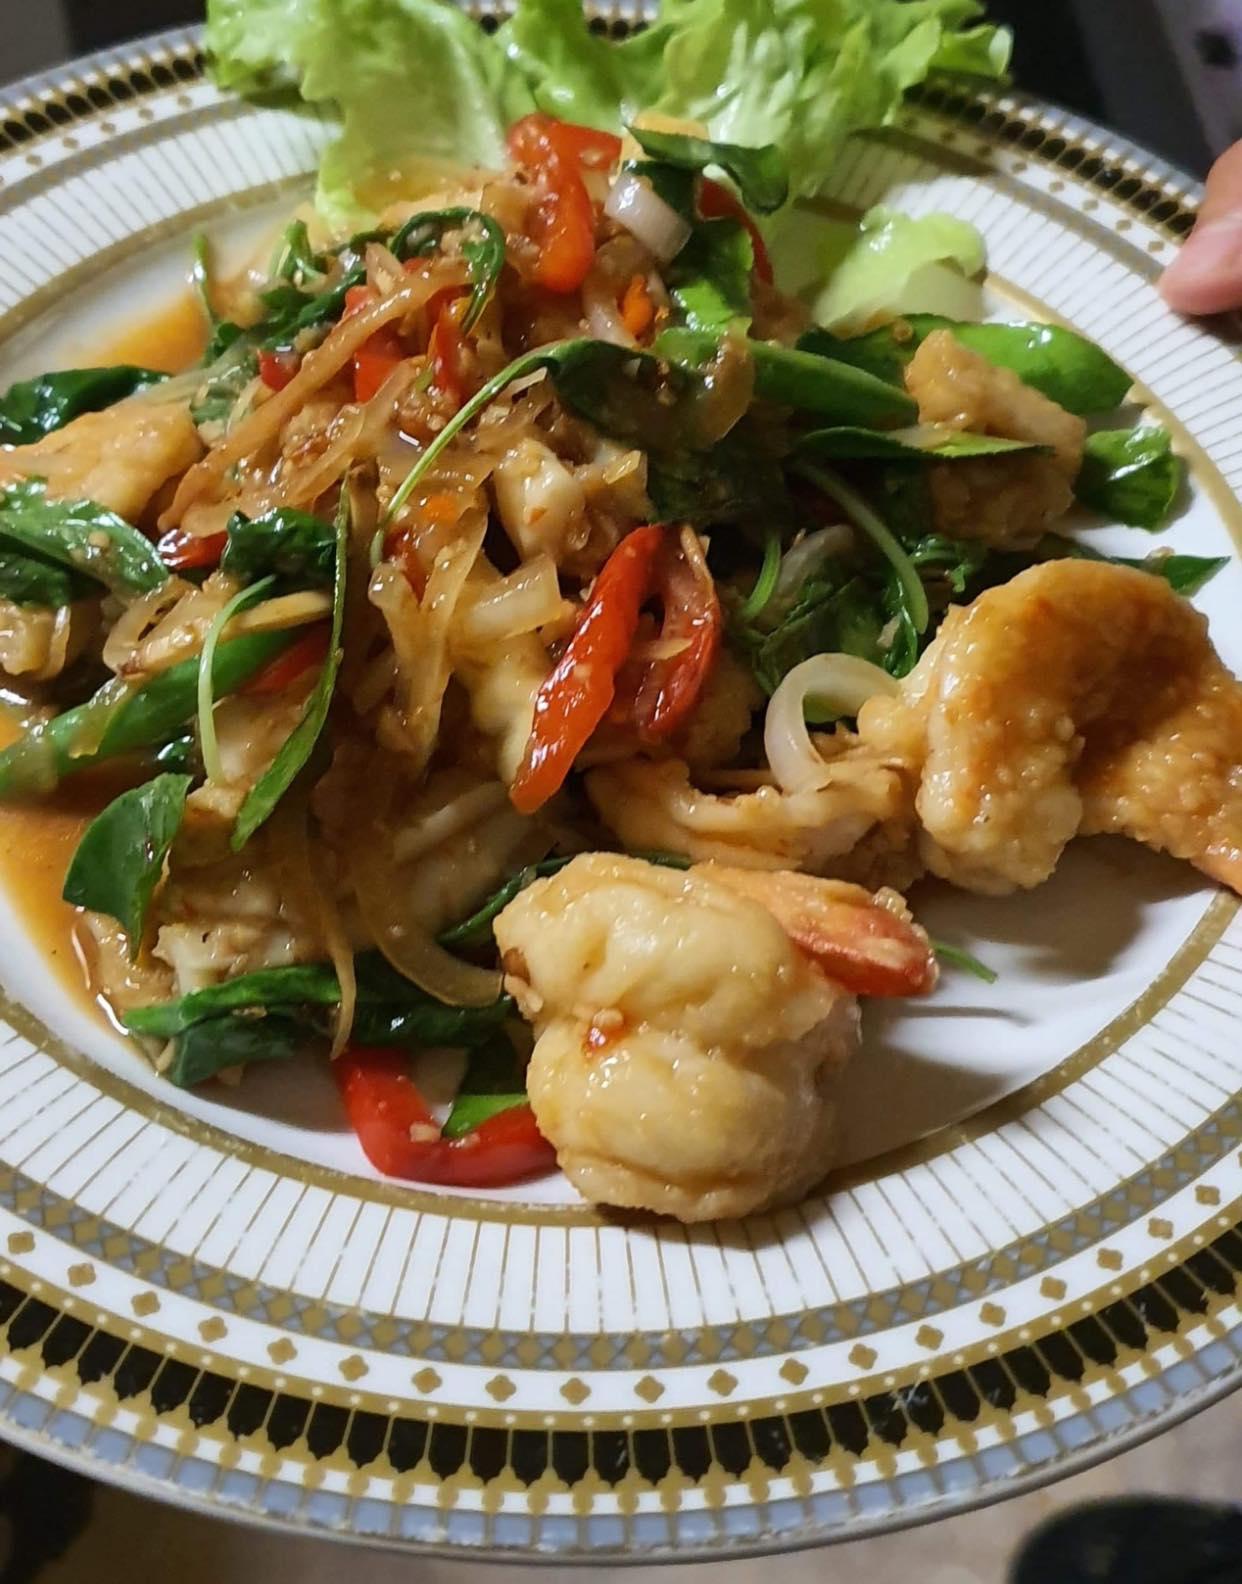 Orchid Floral Thai Cuisine Childers